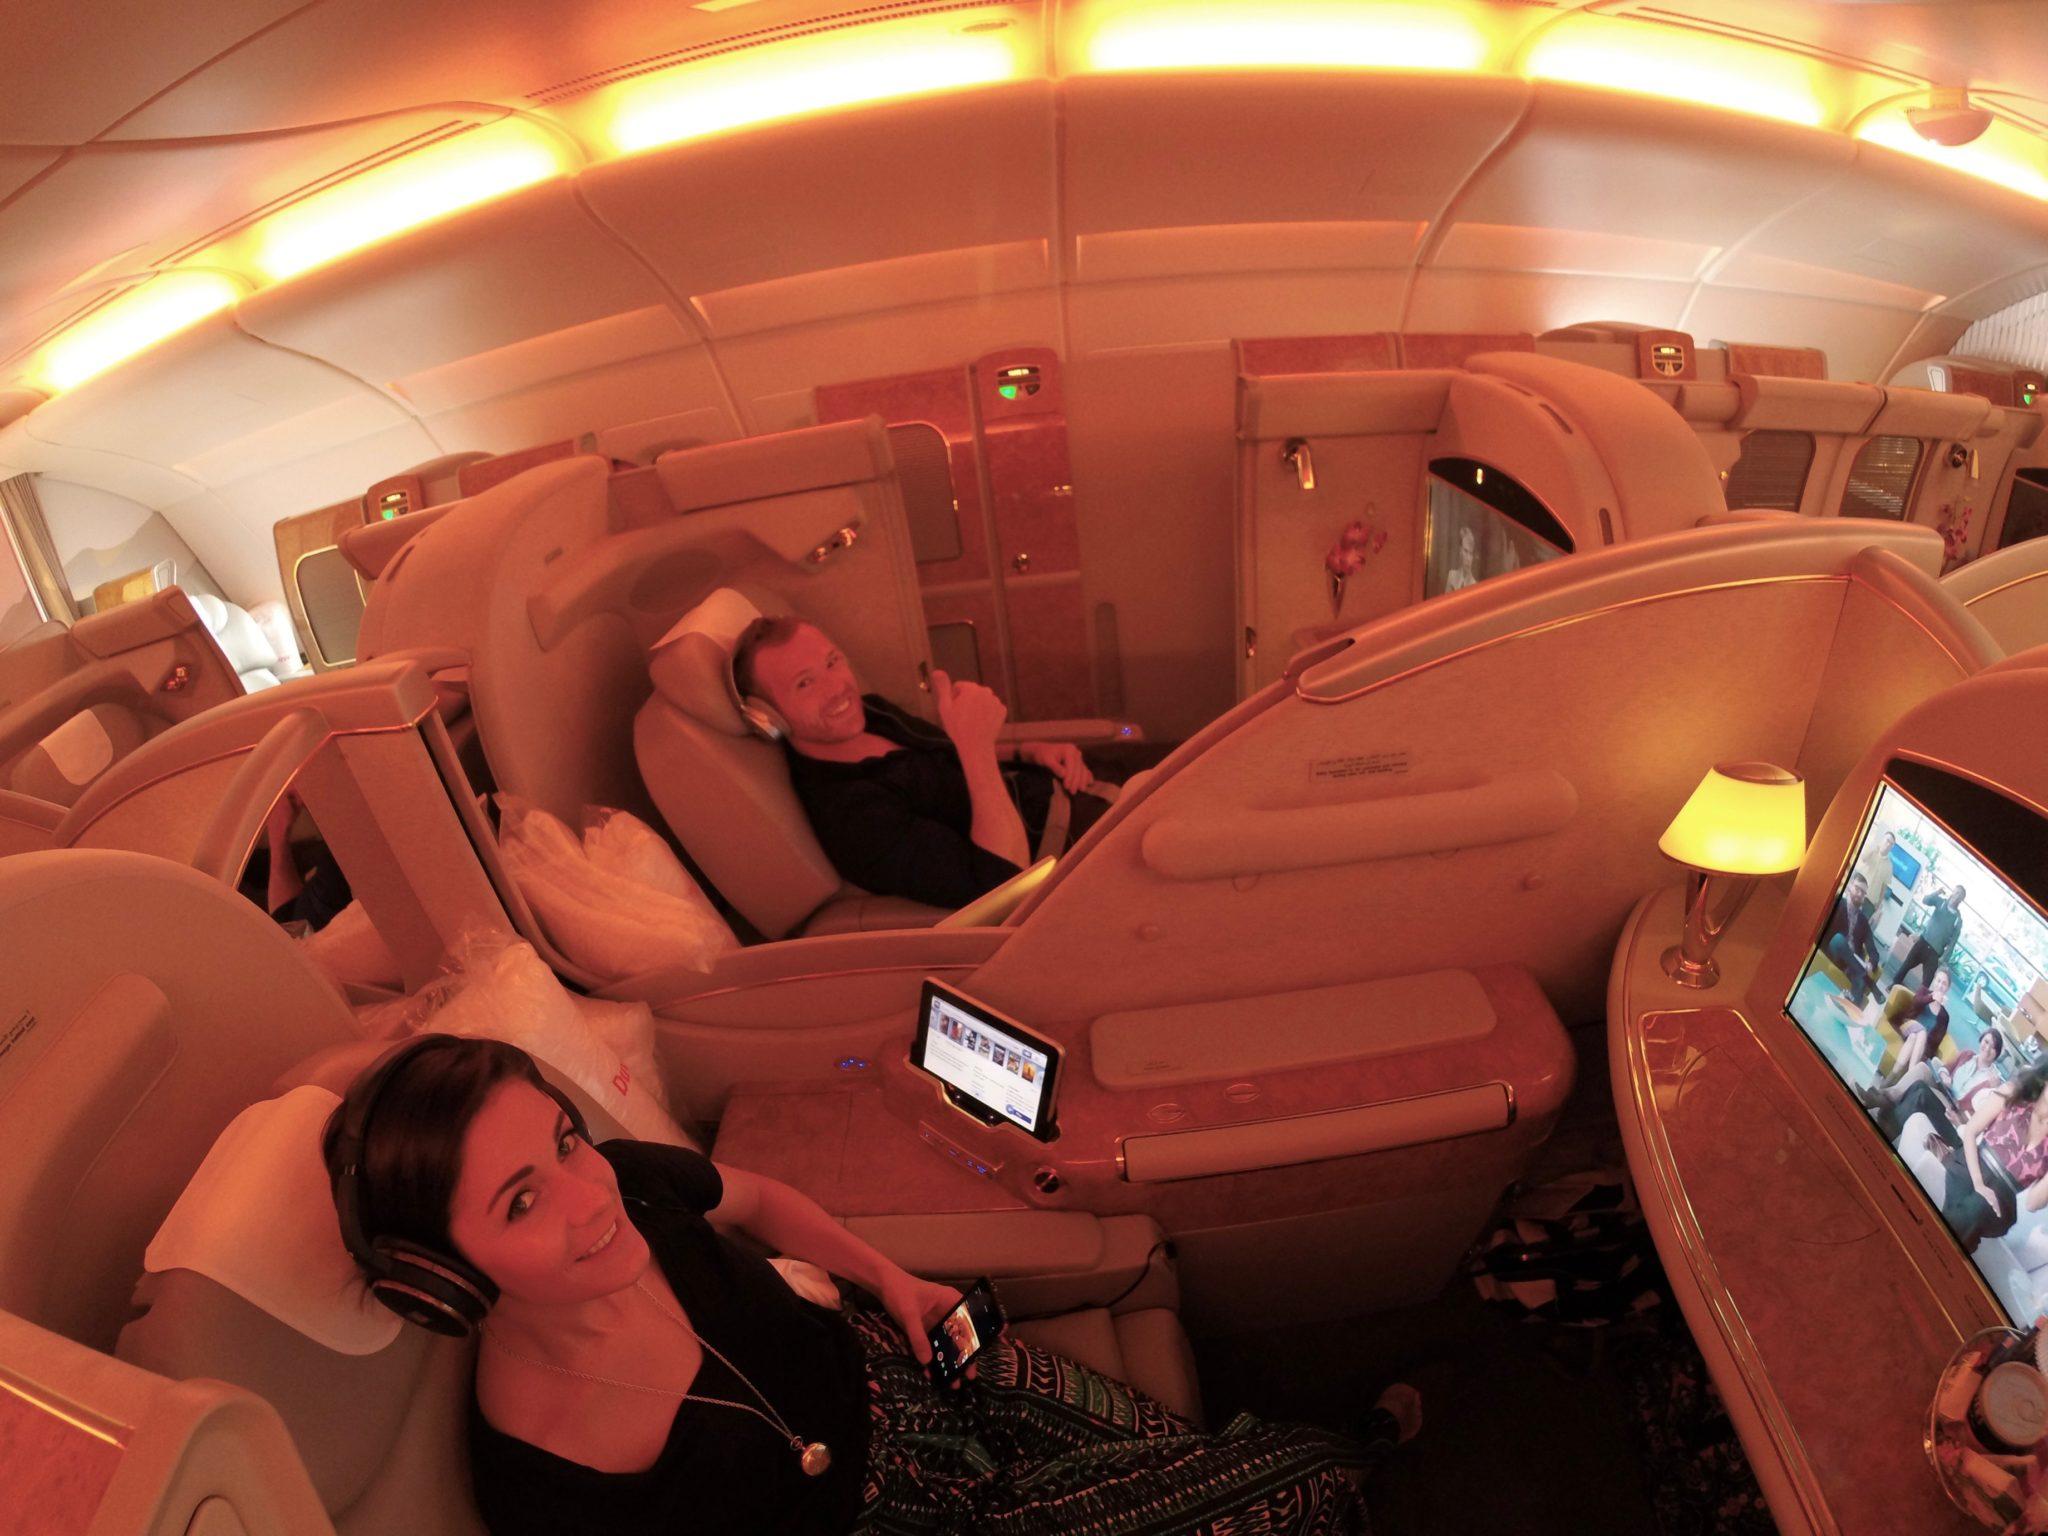 Emirates First Class A380 - Couple Enjoying The Flight